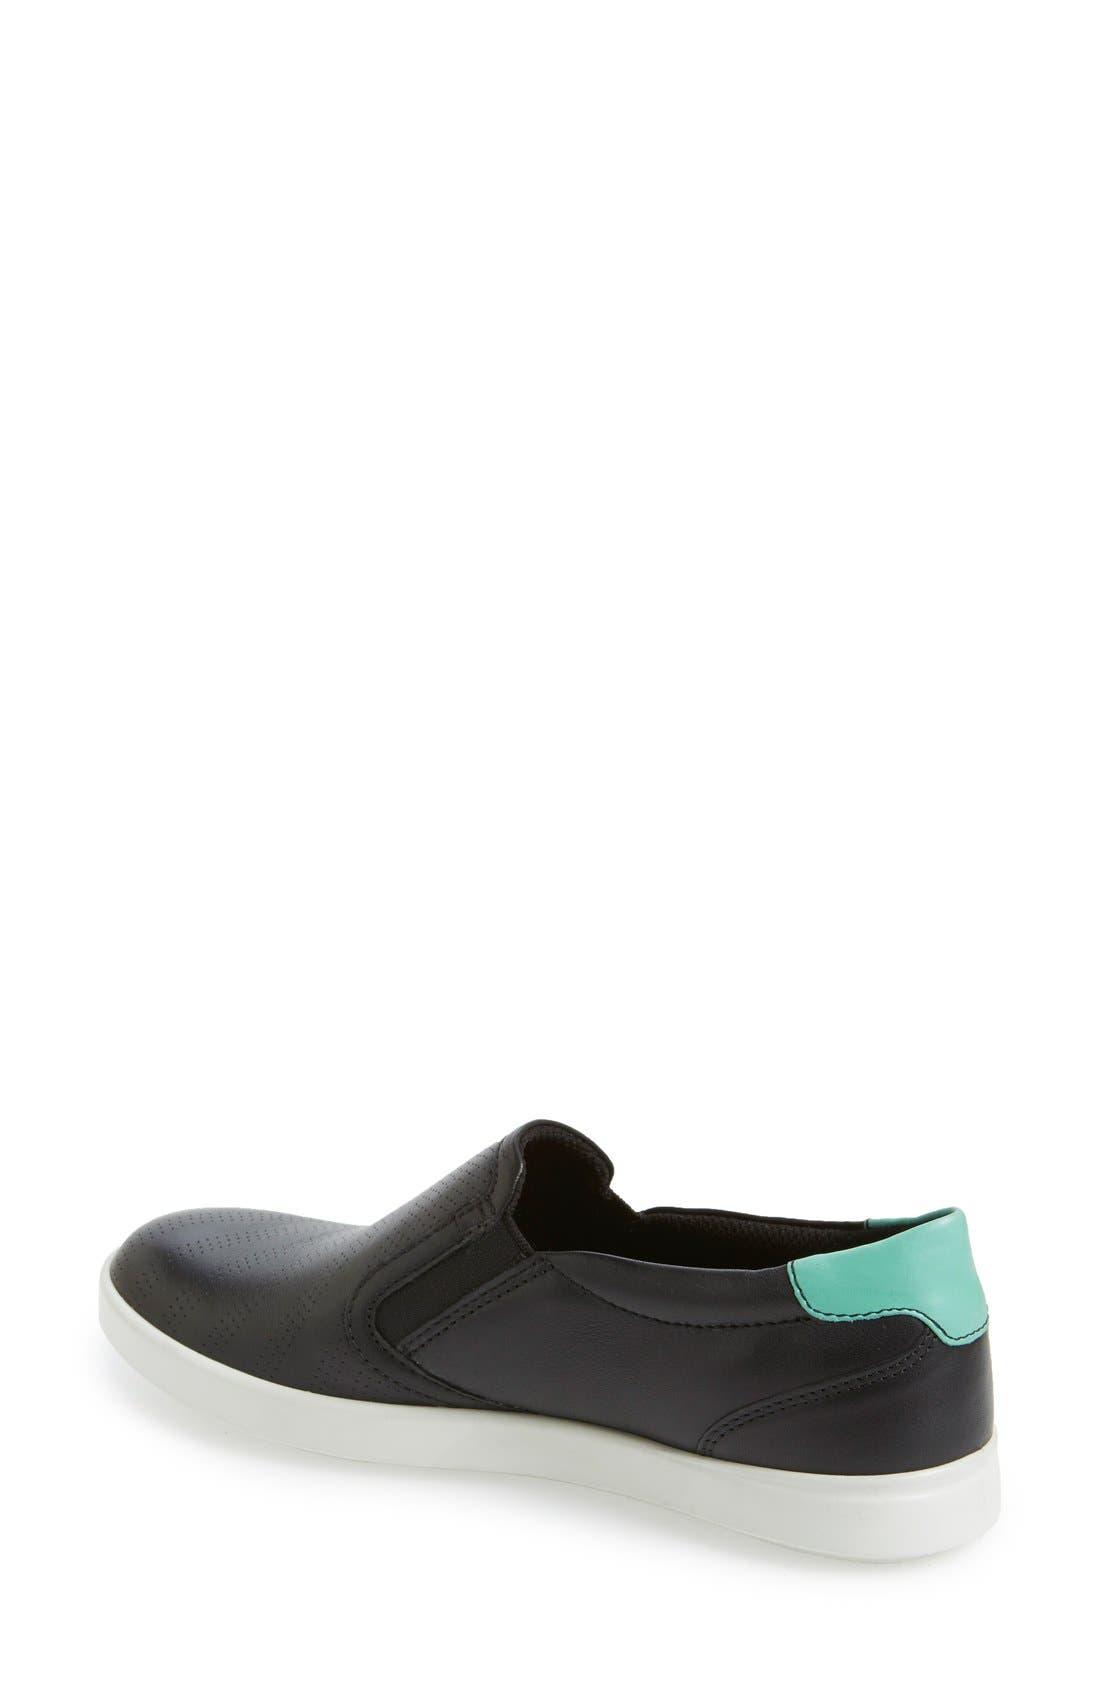 Alternate Image 2  - ECCO 'Aimee' Slip-On Sneaker (Women)